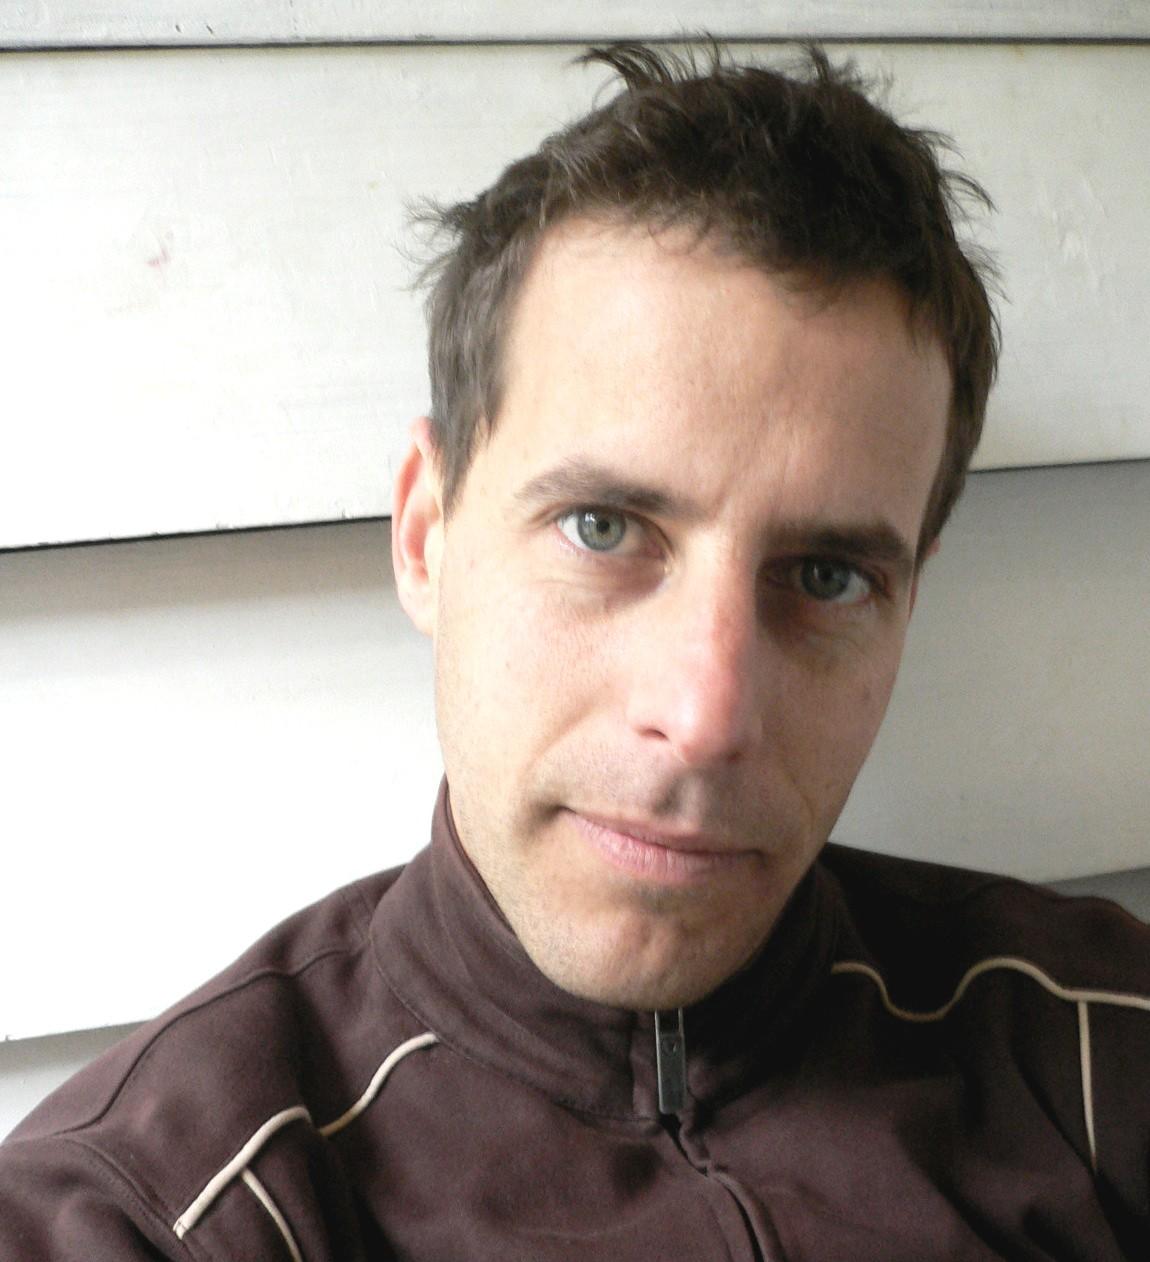 Sybrandus Adema